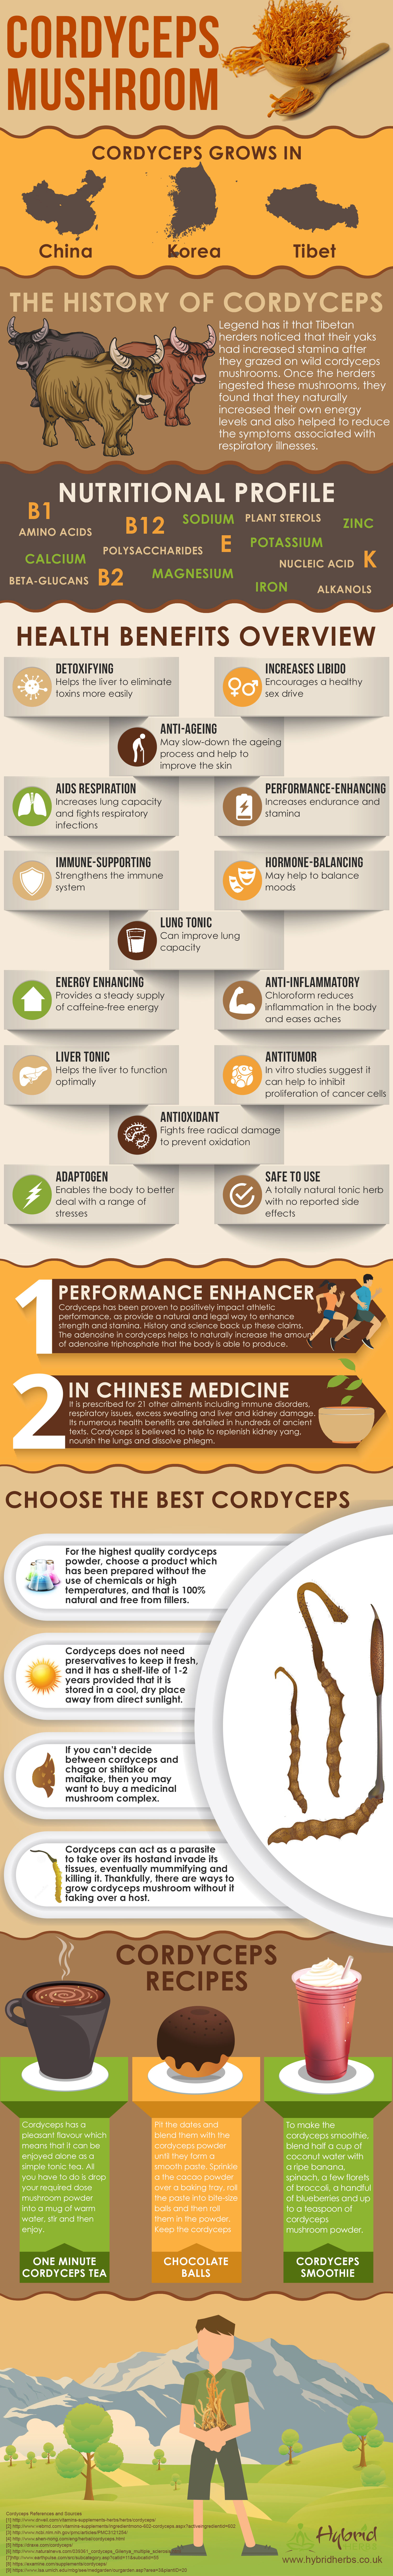 cordyceps-mushroom-health-benefits.jpg